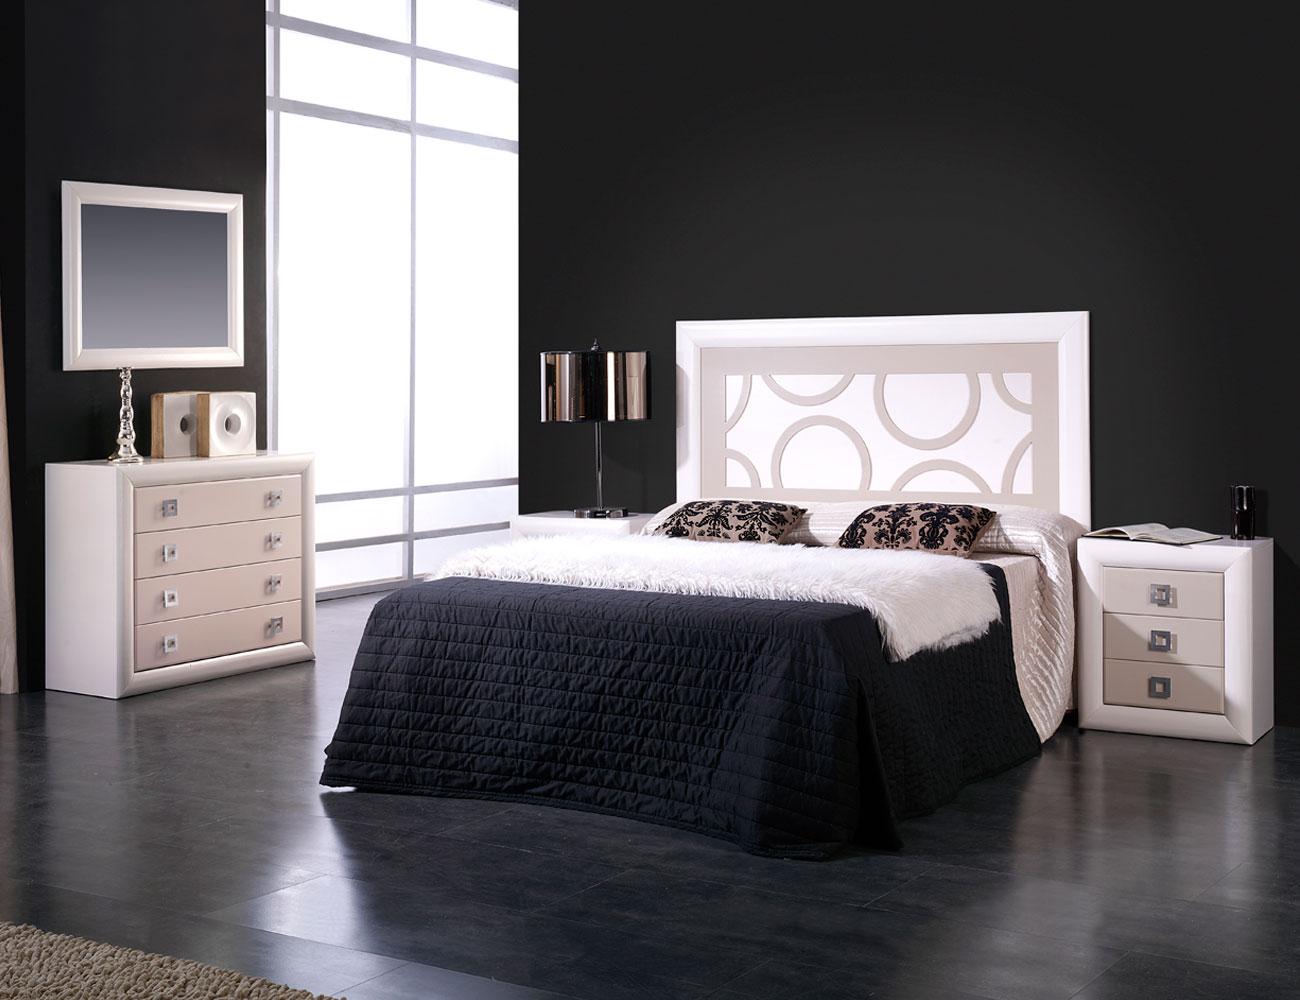 Dormitorio matrimonio lacado blanco roto piedra1